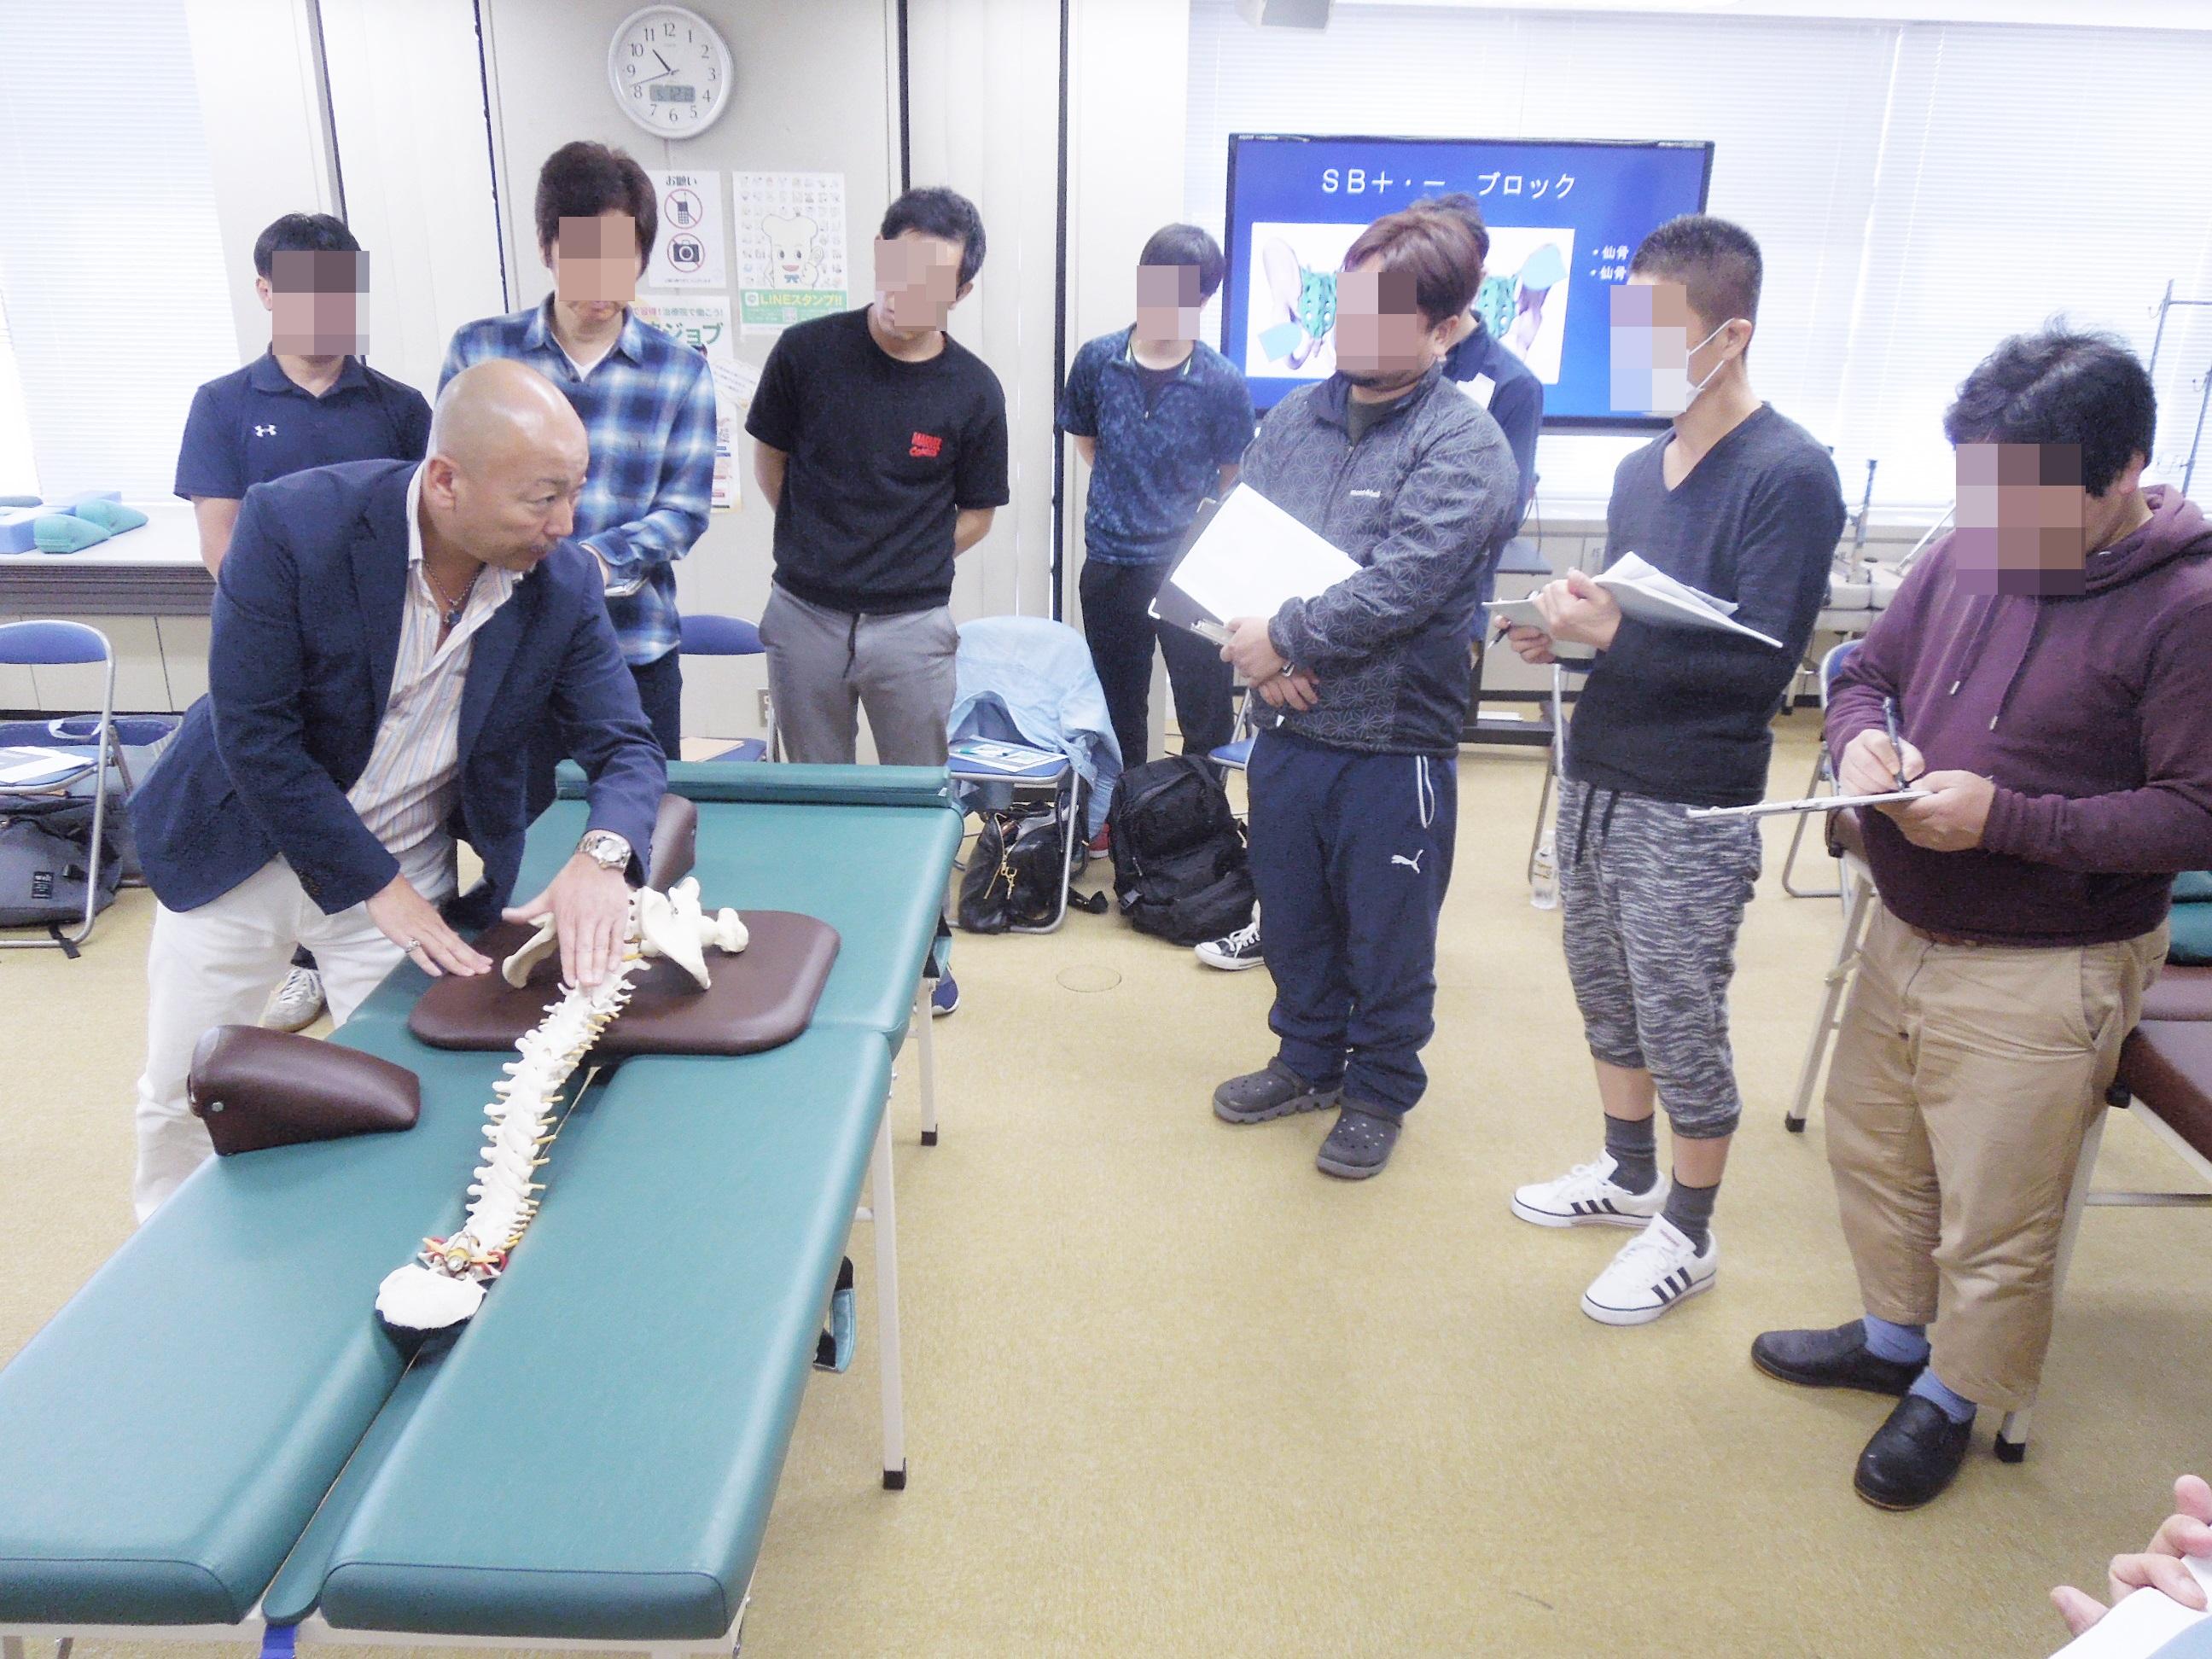 R01.5.12『H.M.B.T(ハイブリッド・メソッド・ブロック・テクニック)腰部疾患、慢性腰痛、分離・すべり症 等』(大阪)